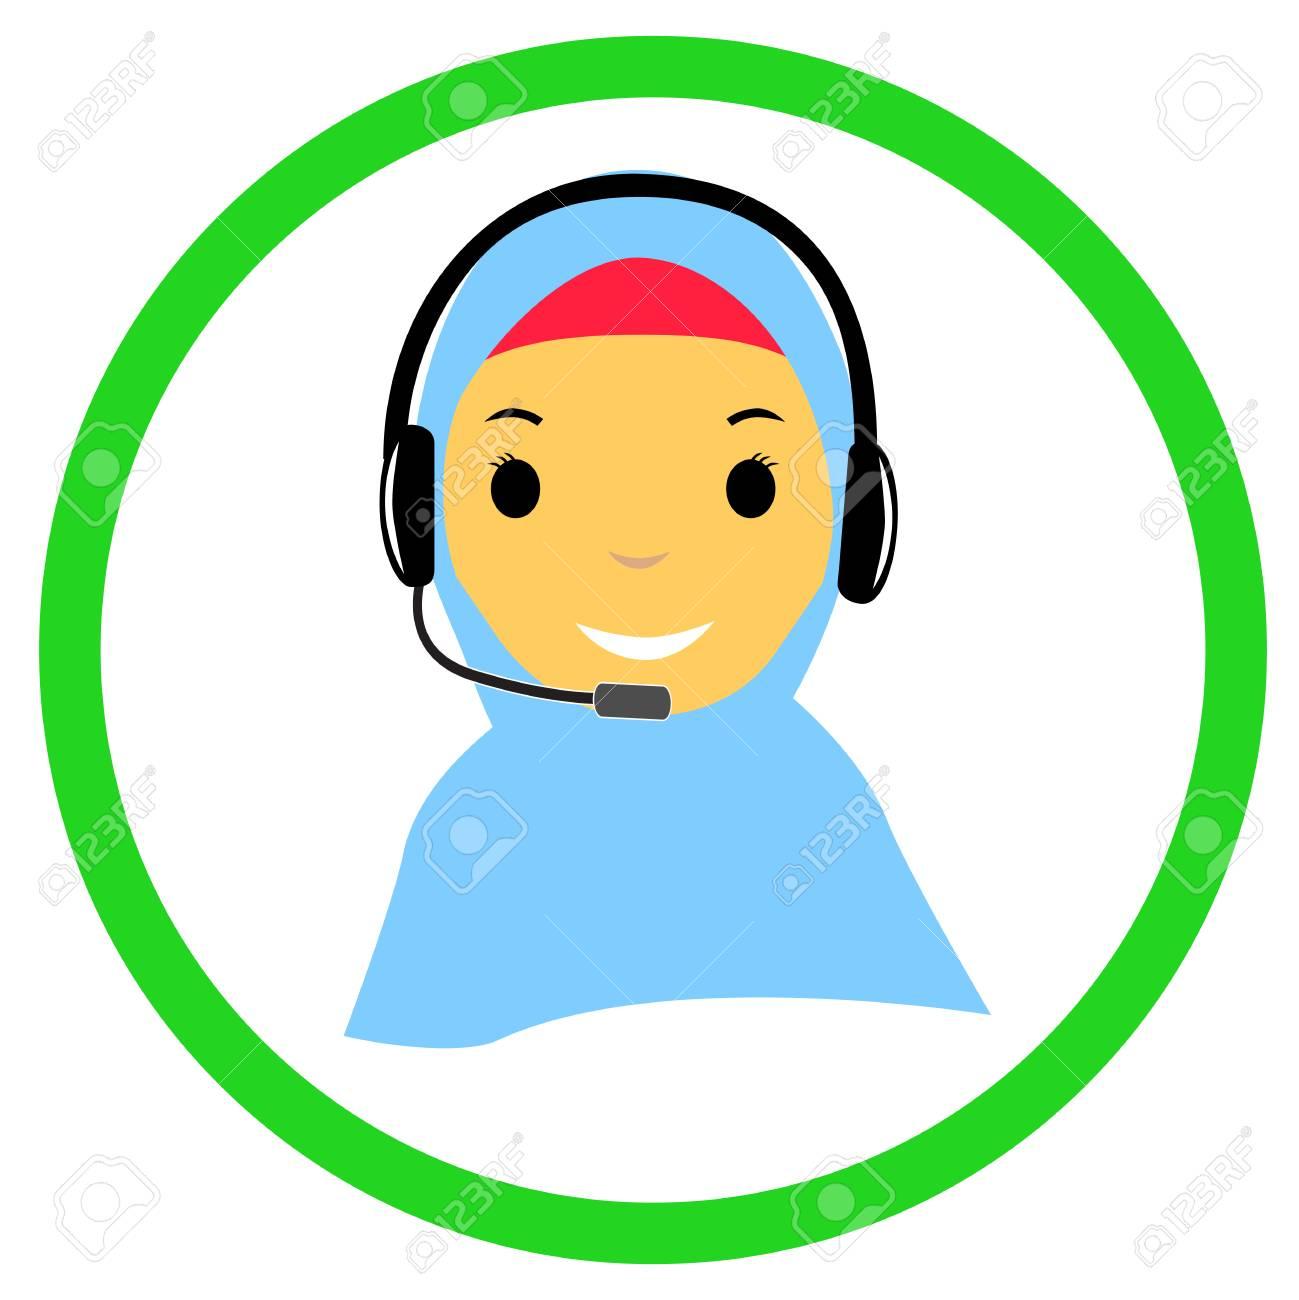 Hasil gambar untuk customer service operator muslimah